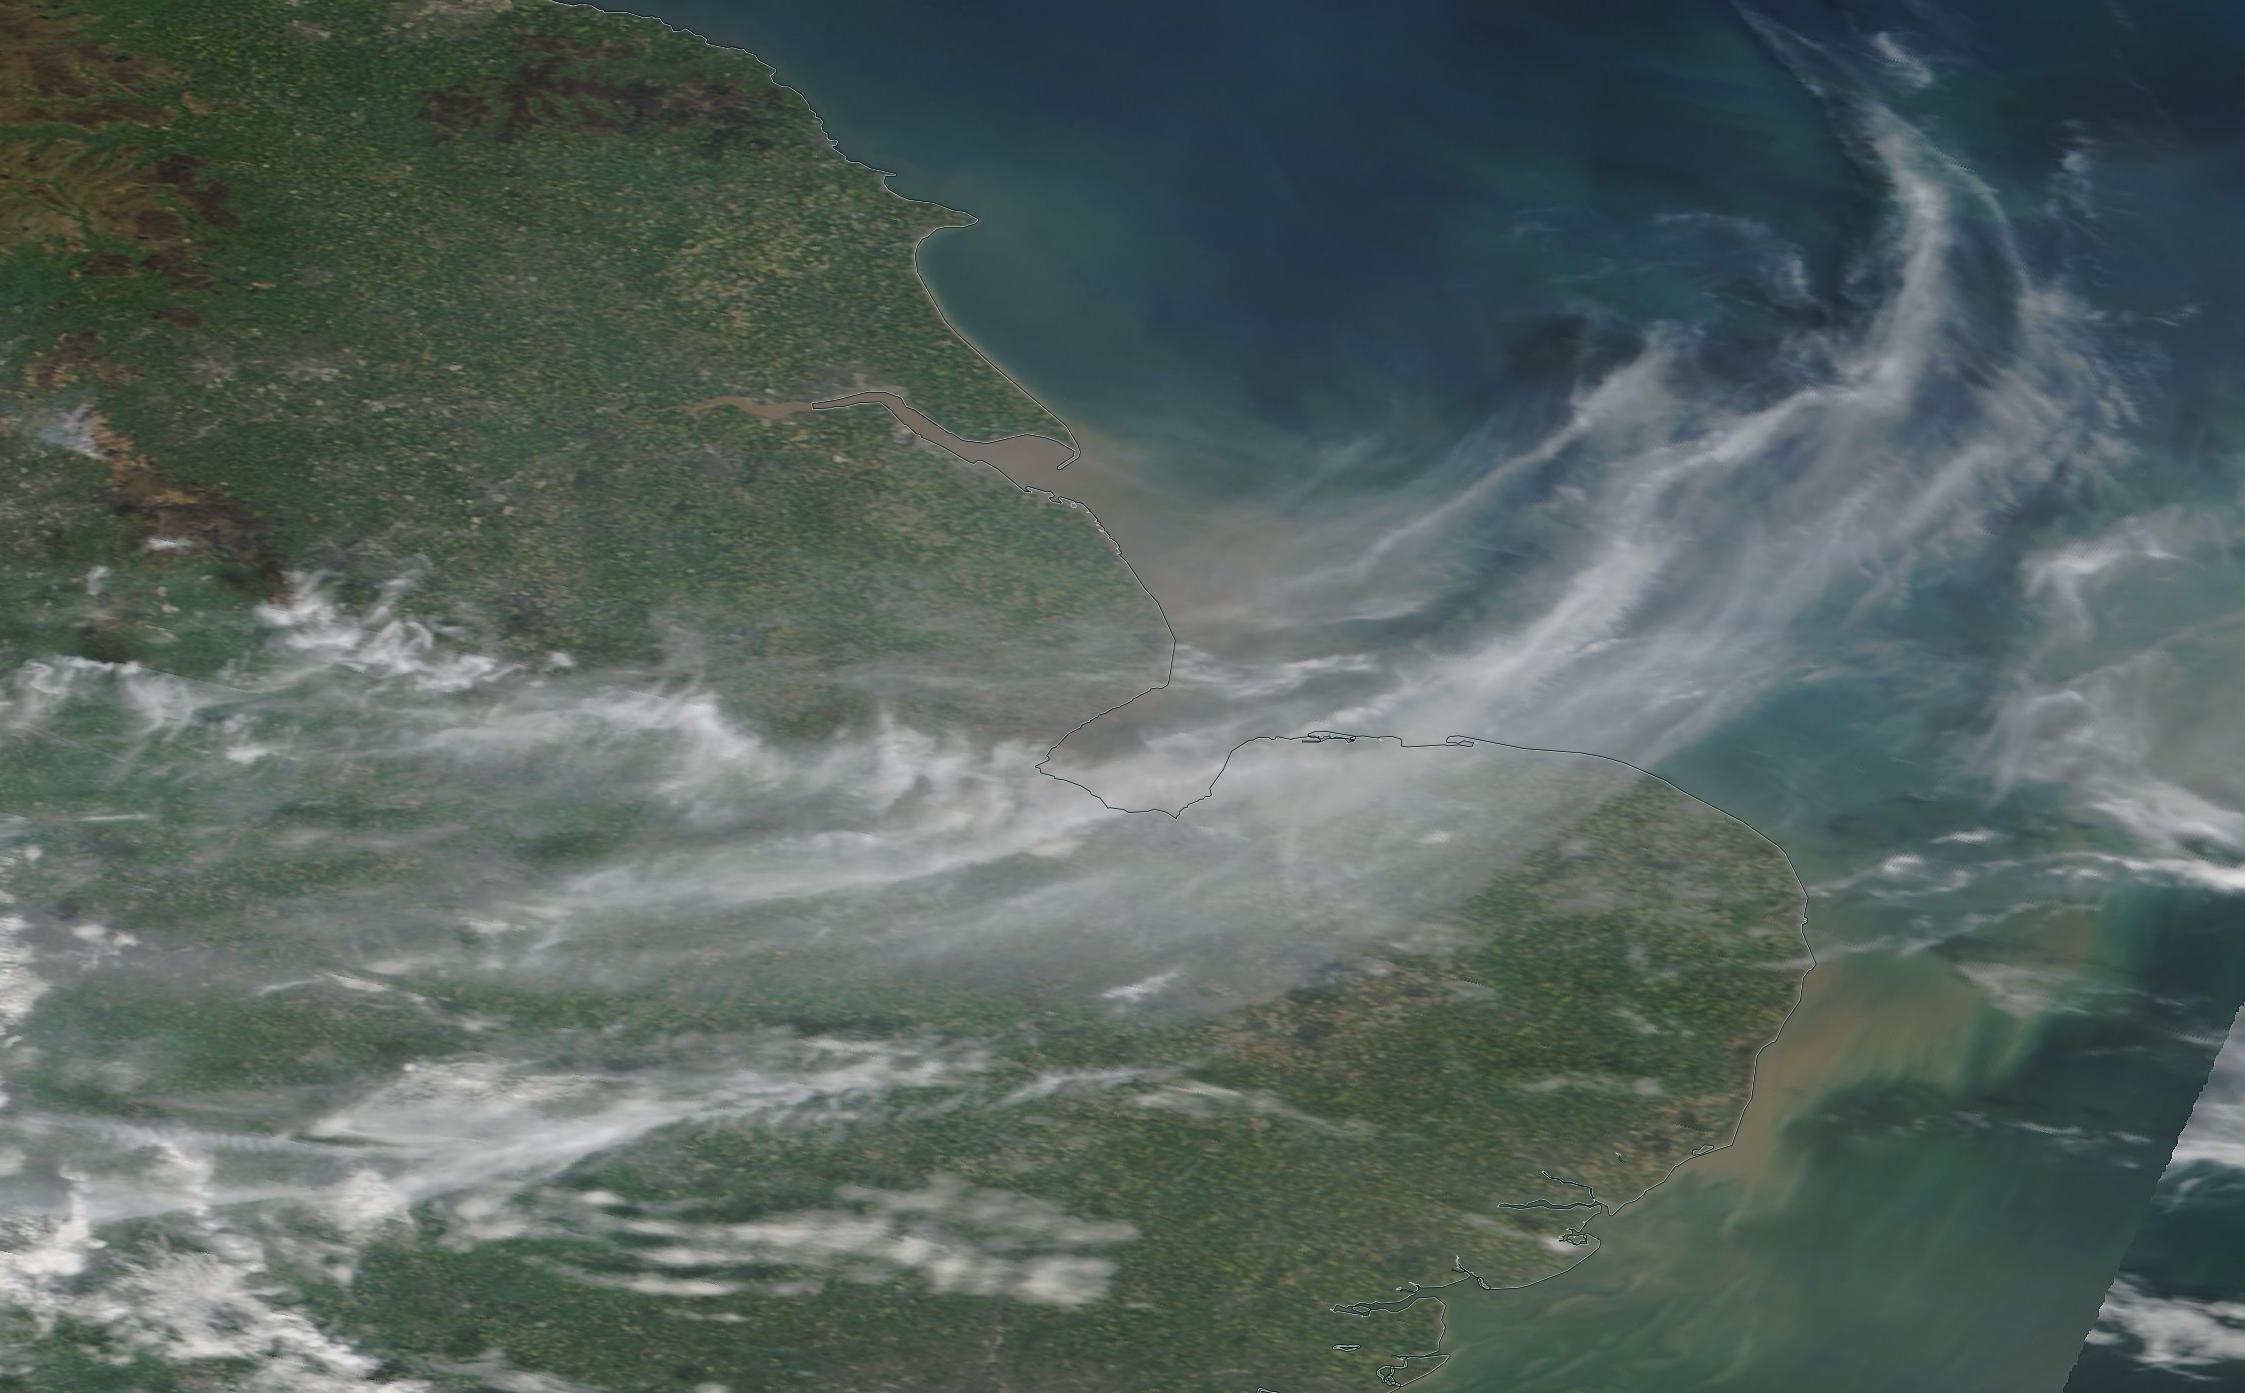 chemtrail geoenginering Norfolk, The Wash, south Midlands 21 April 2019 ... https://go.nasa.gov/2UScgrN